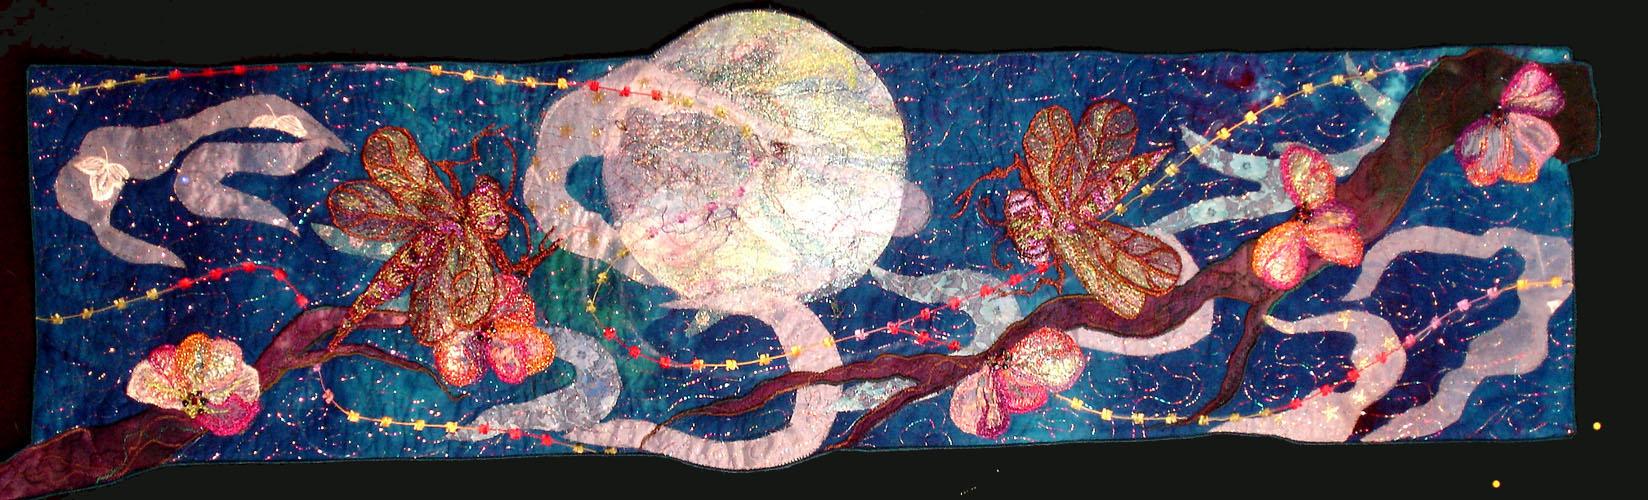 701 Blossom Moon 3 (1)